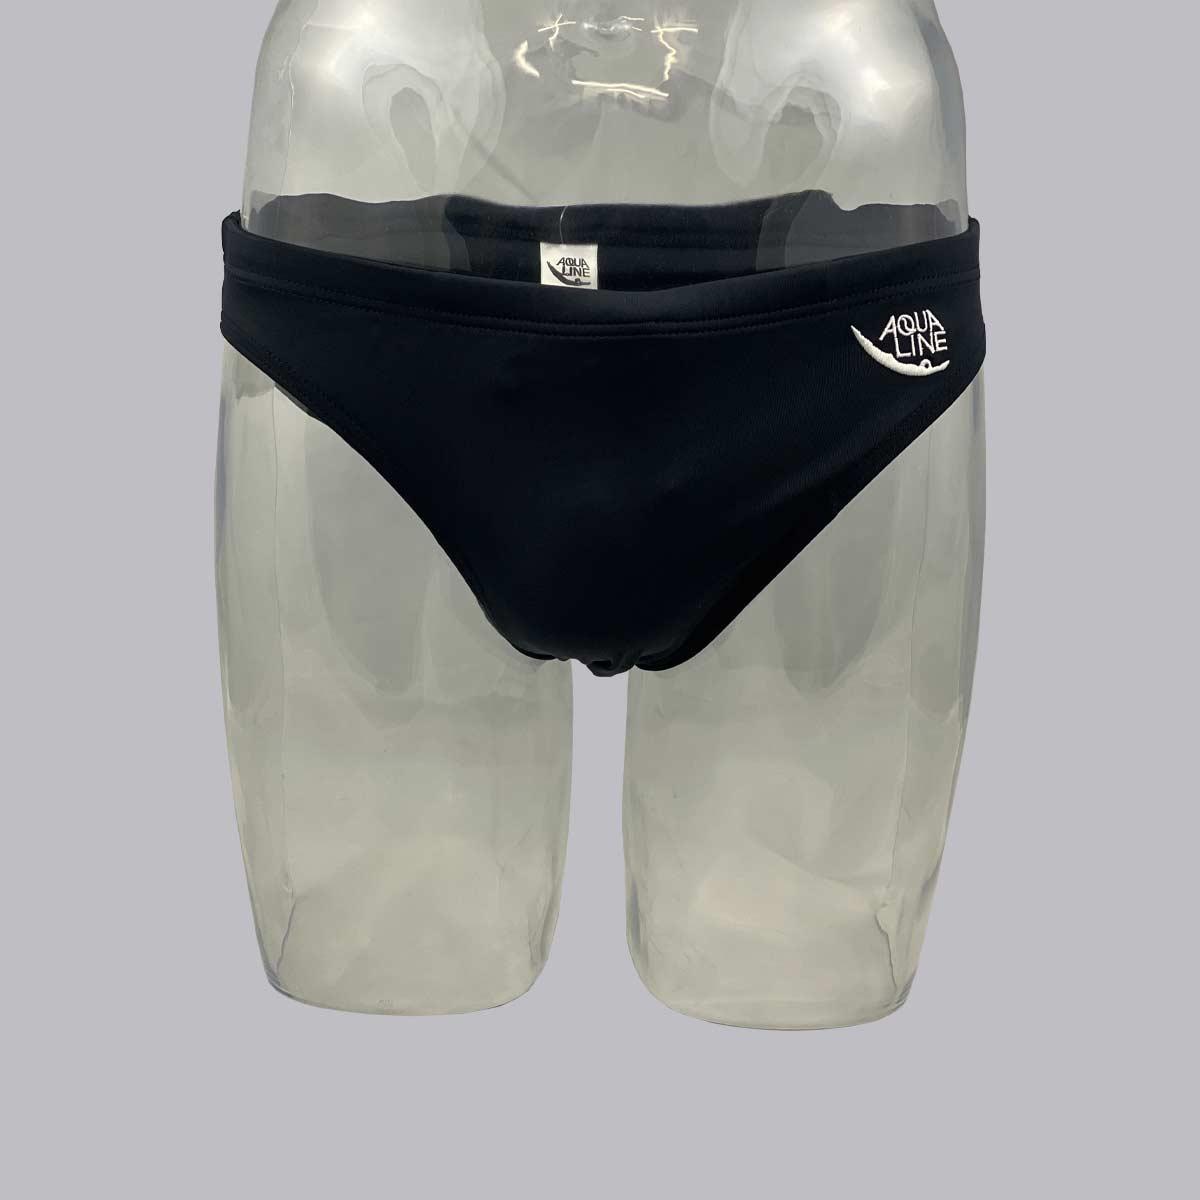 maillot aqualine